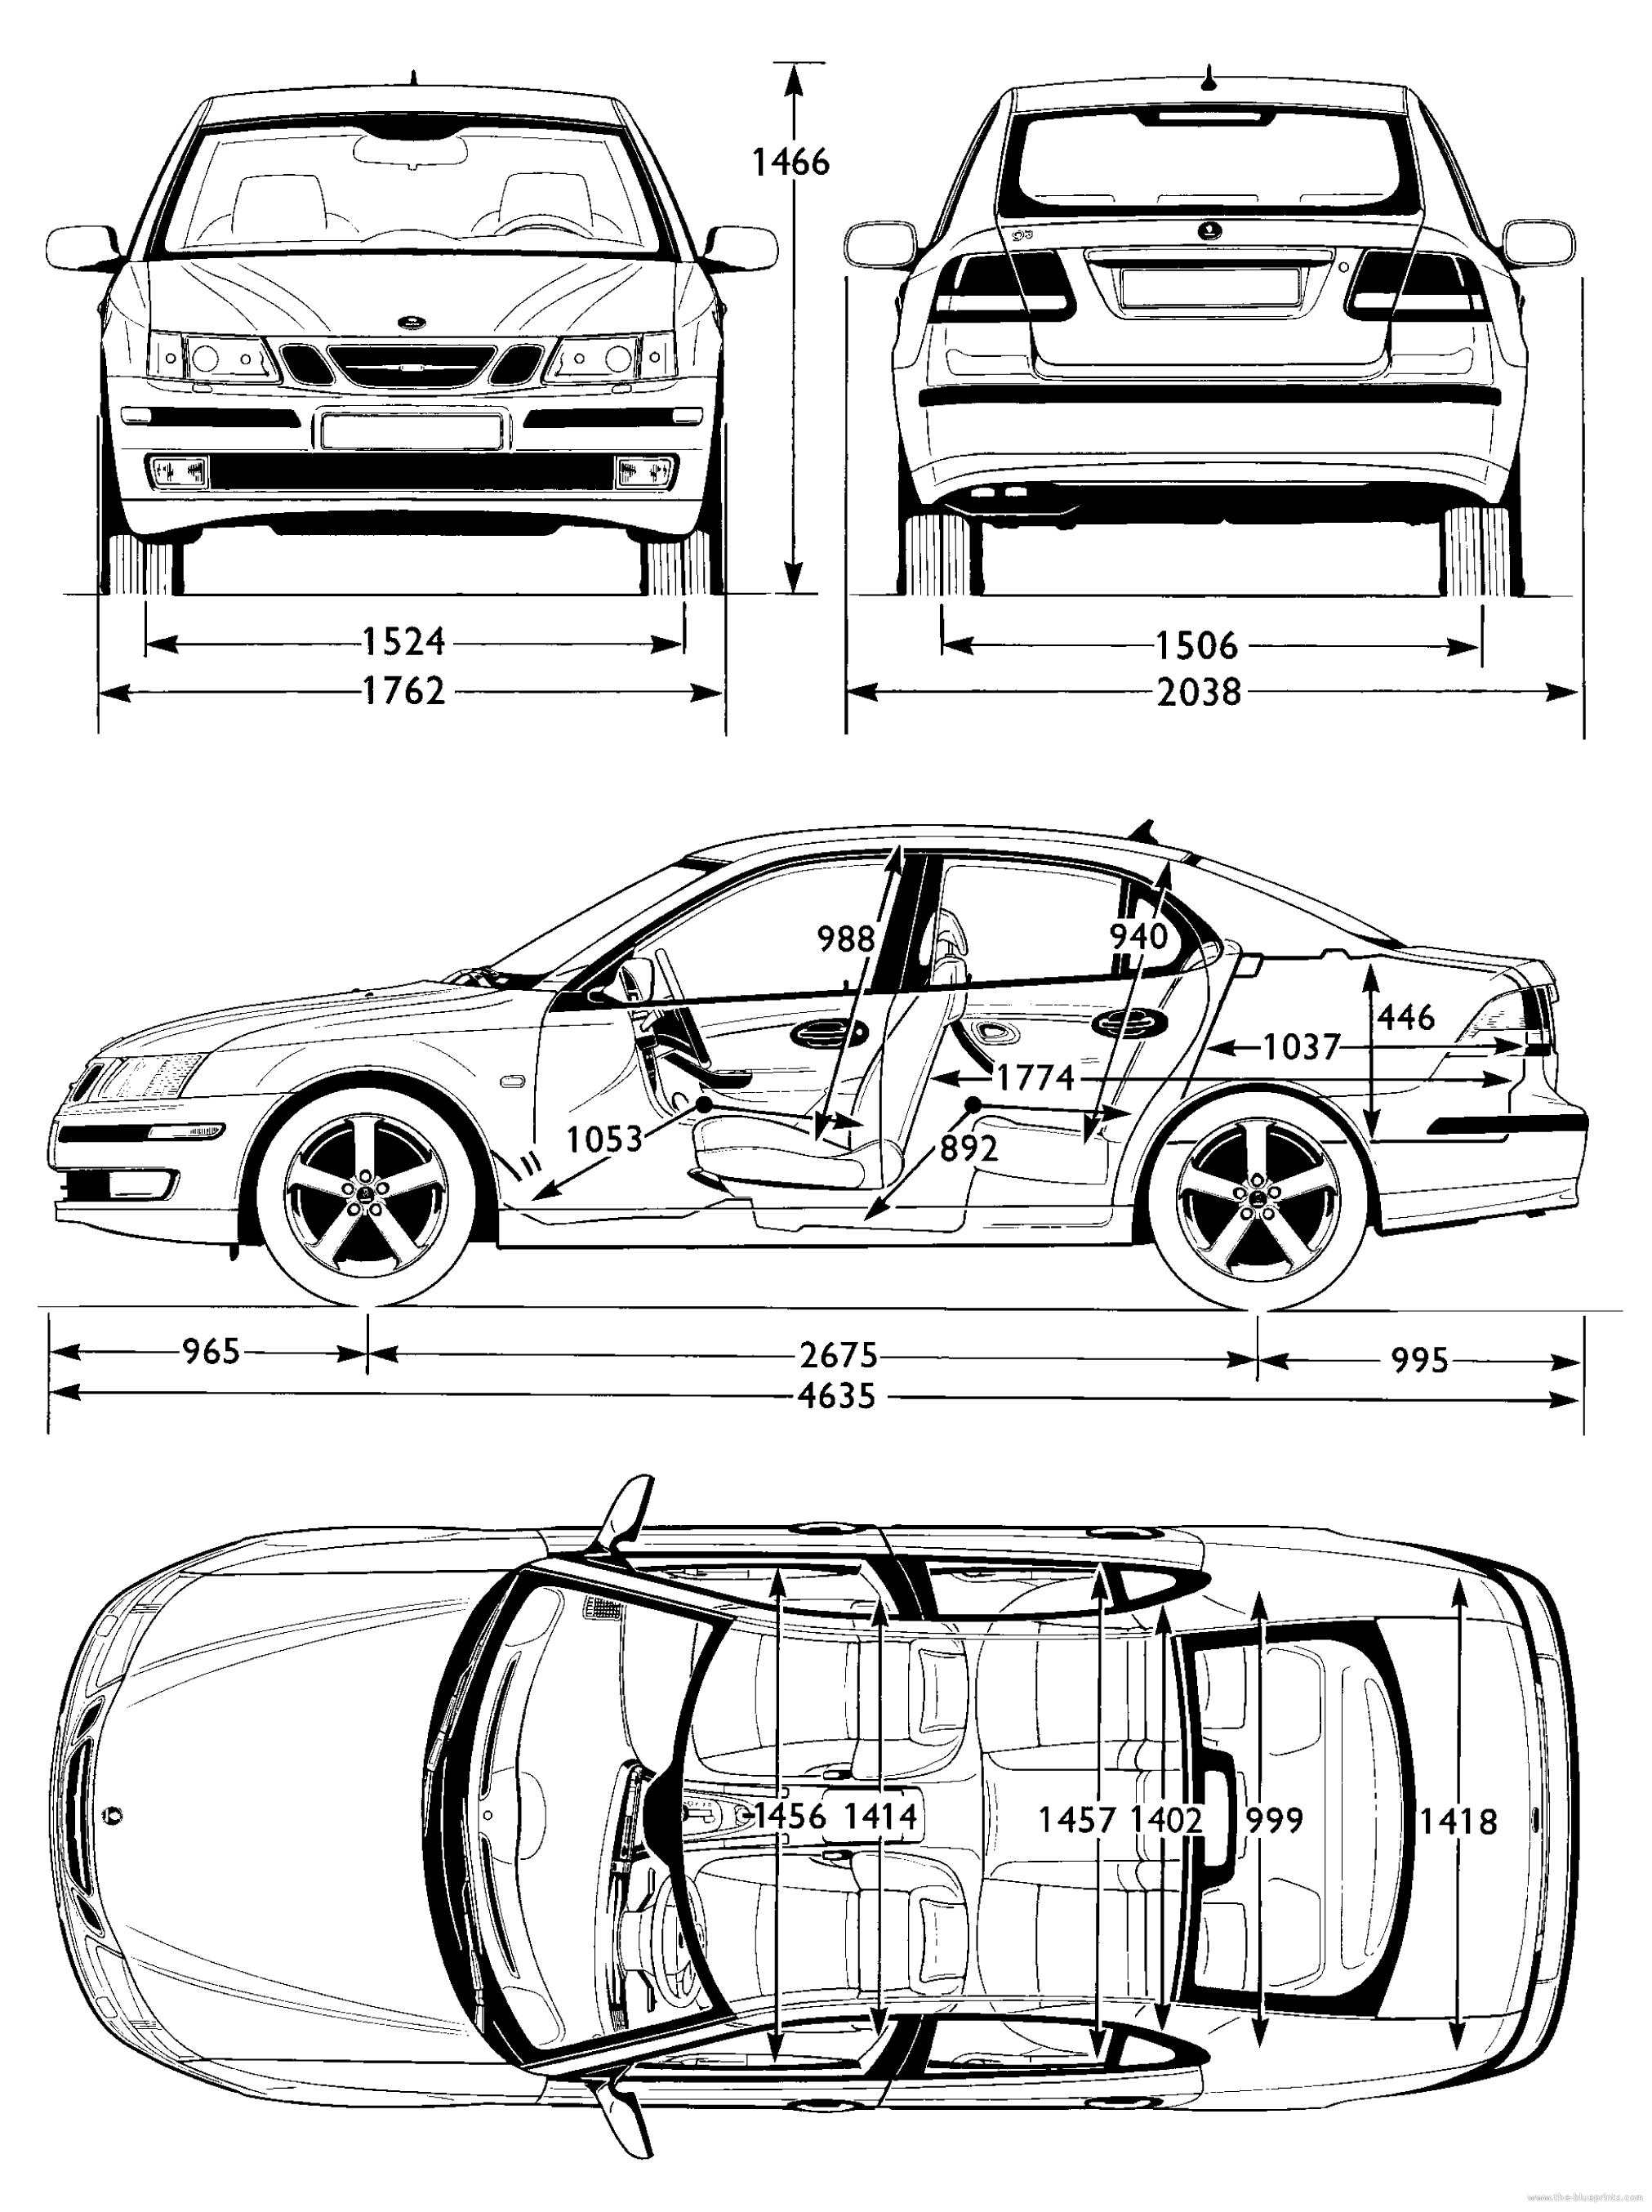 Blueprints Gt Cars Gt Saab Gt Saab 9 3 Aero